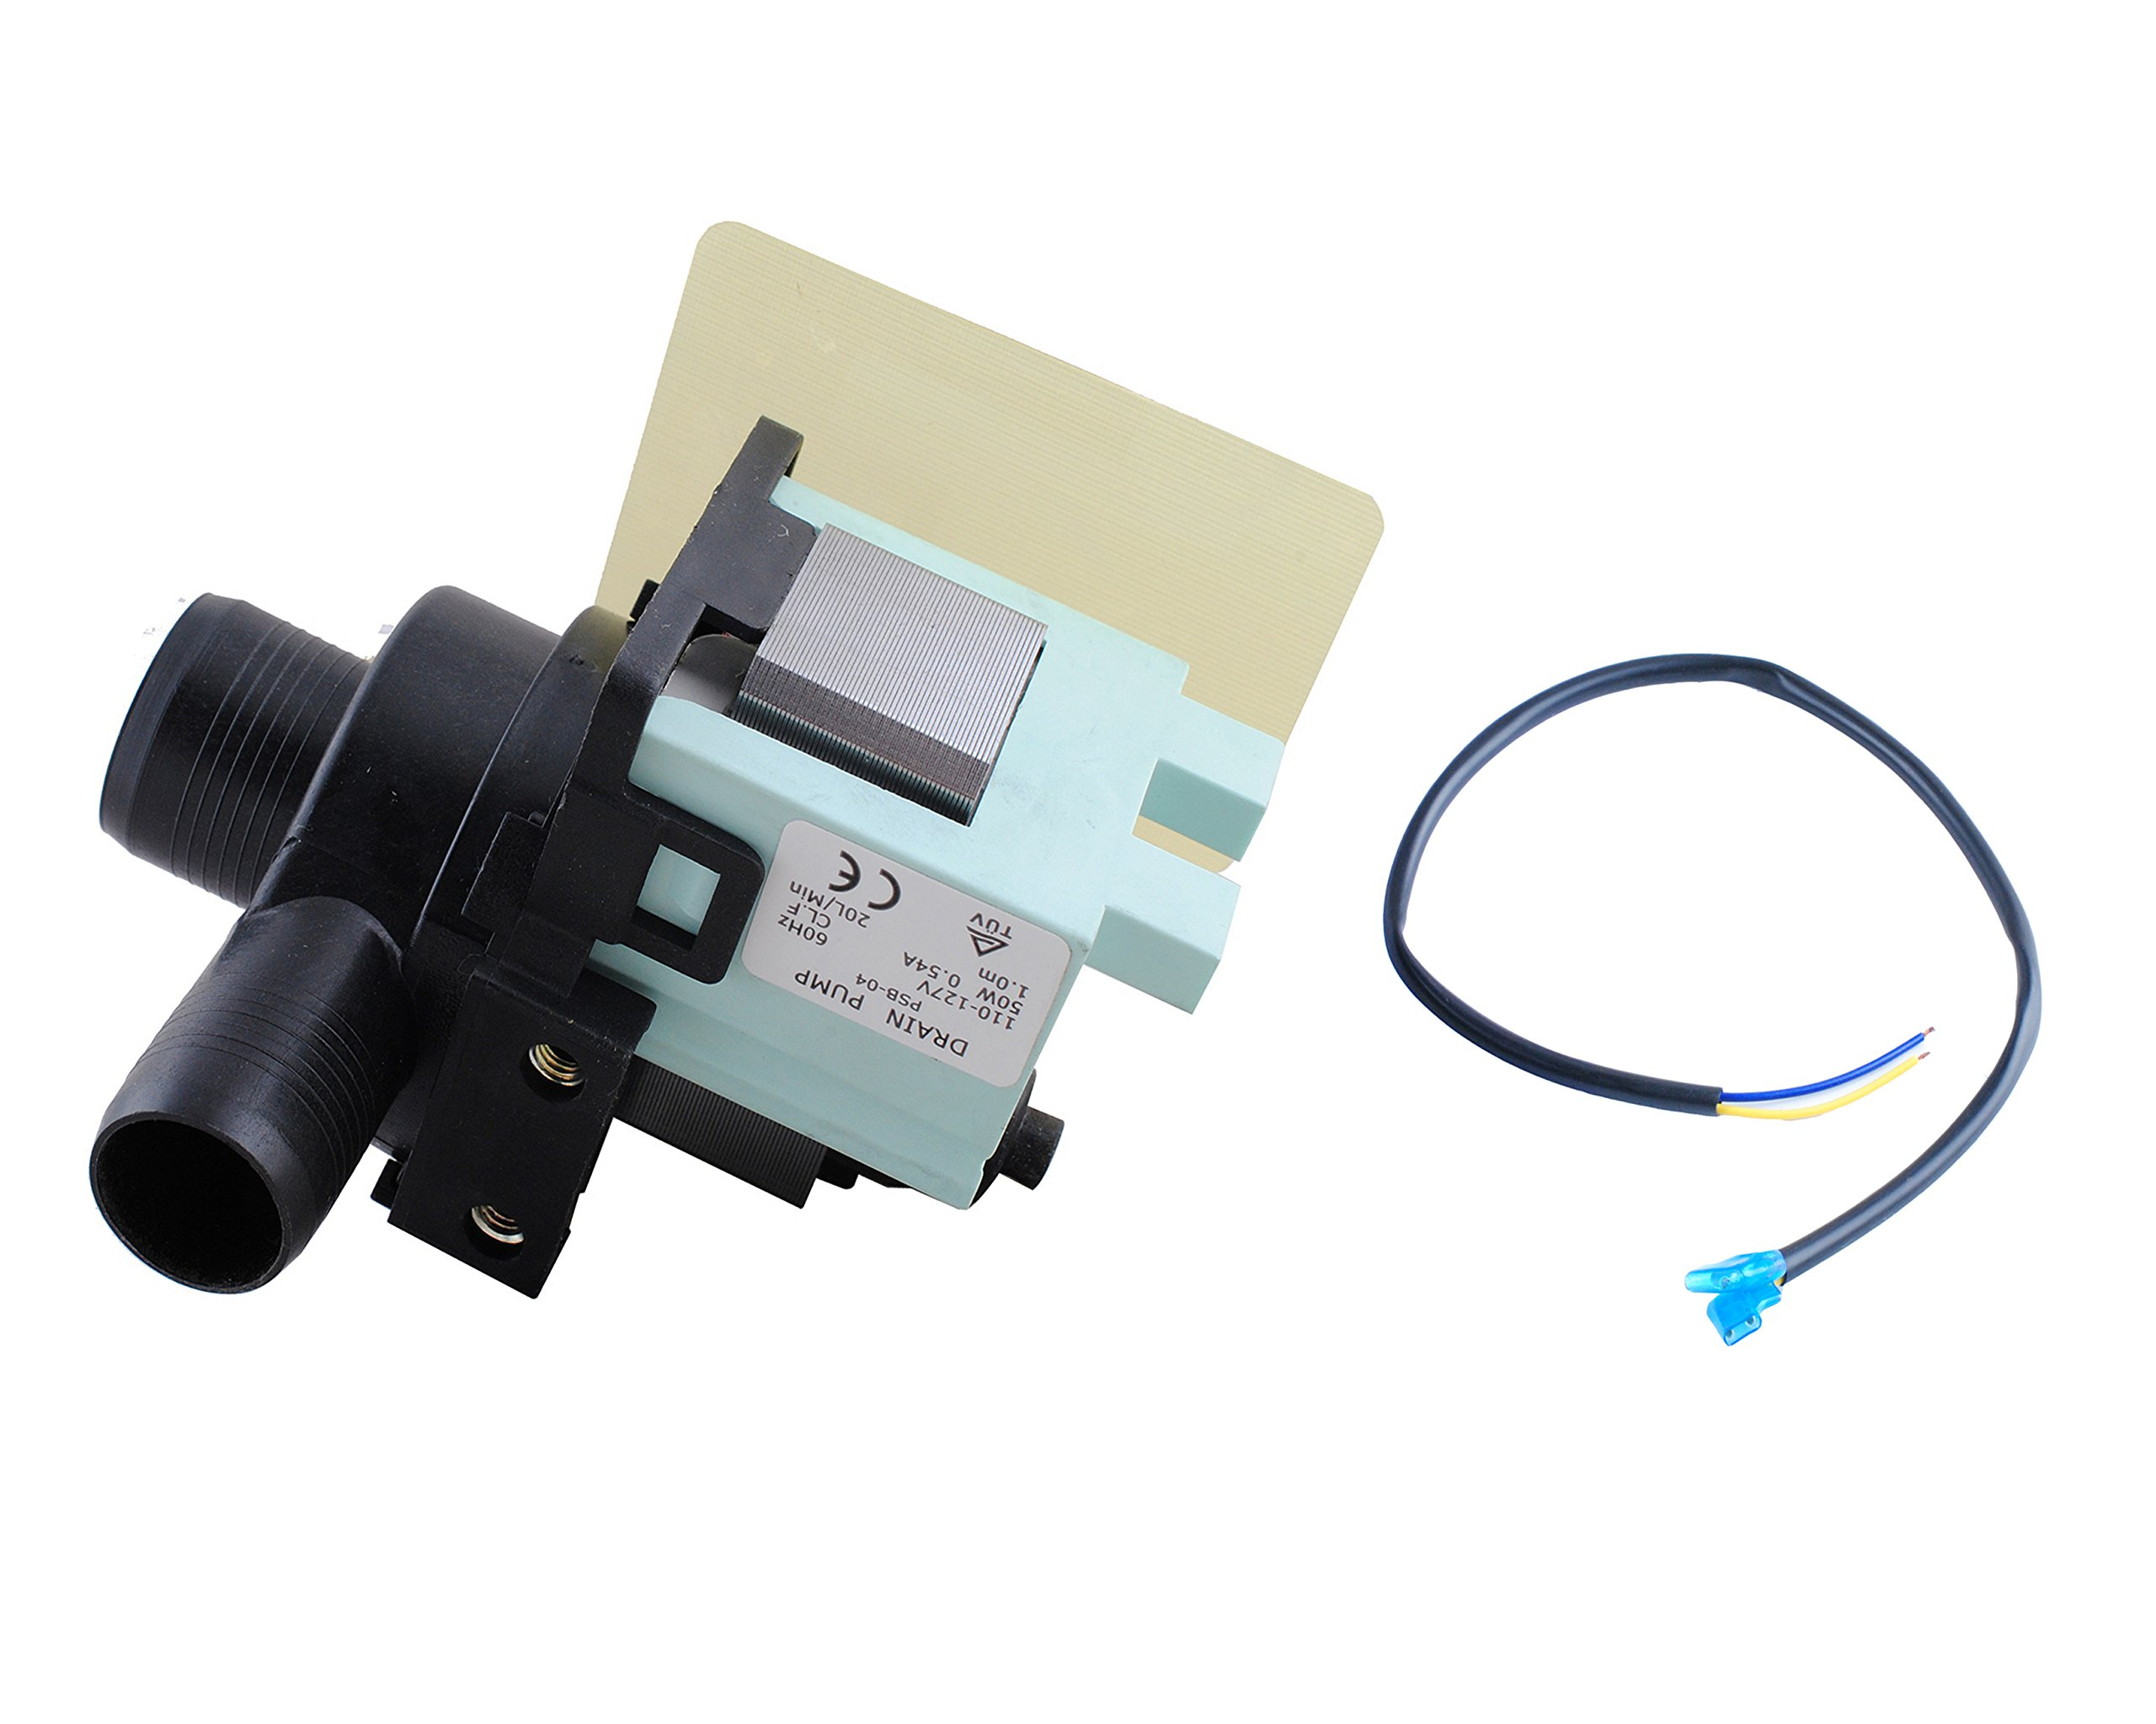 Podoy WD-5470-09 for Washing Drain Pump Haier Machine PPSB-04